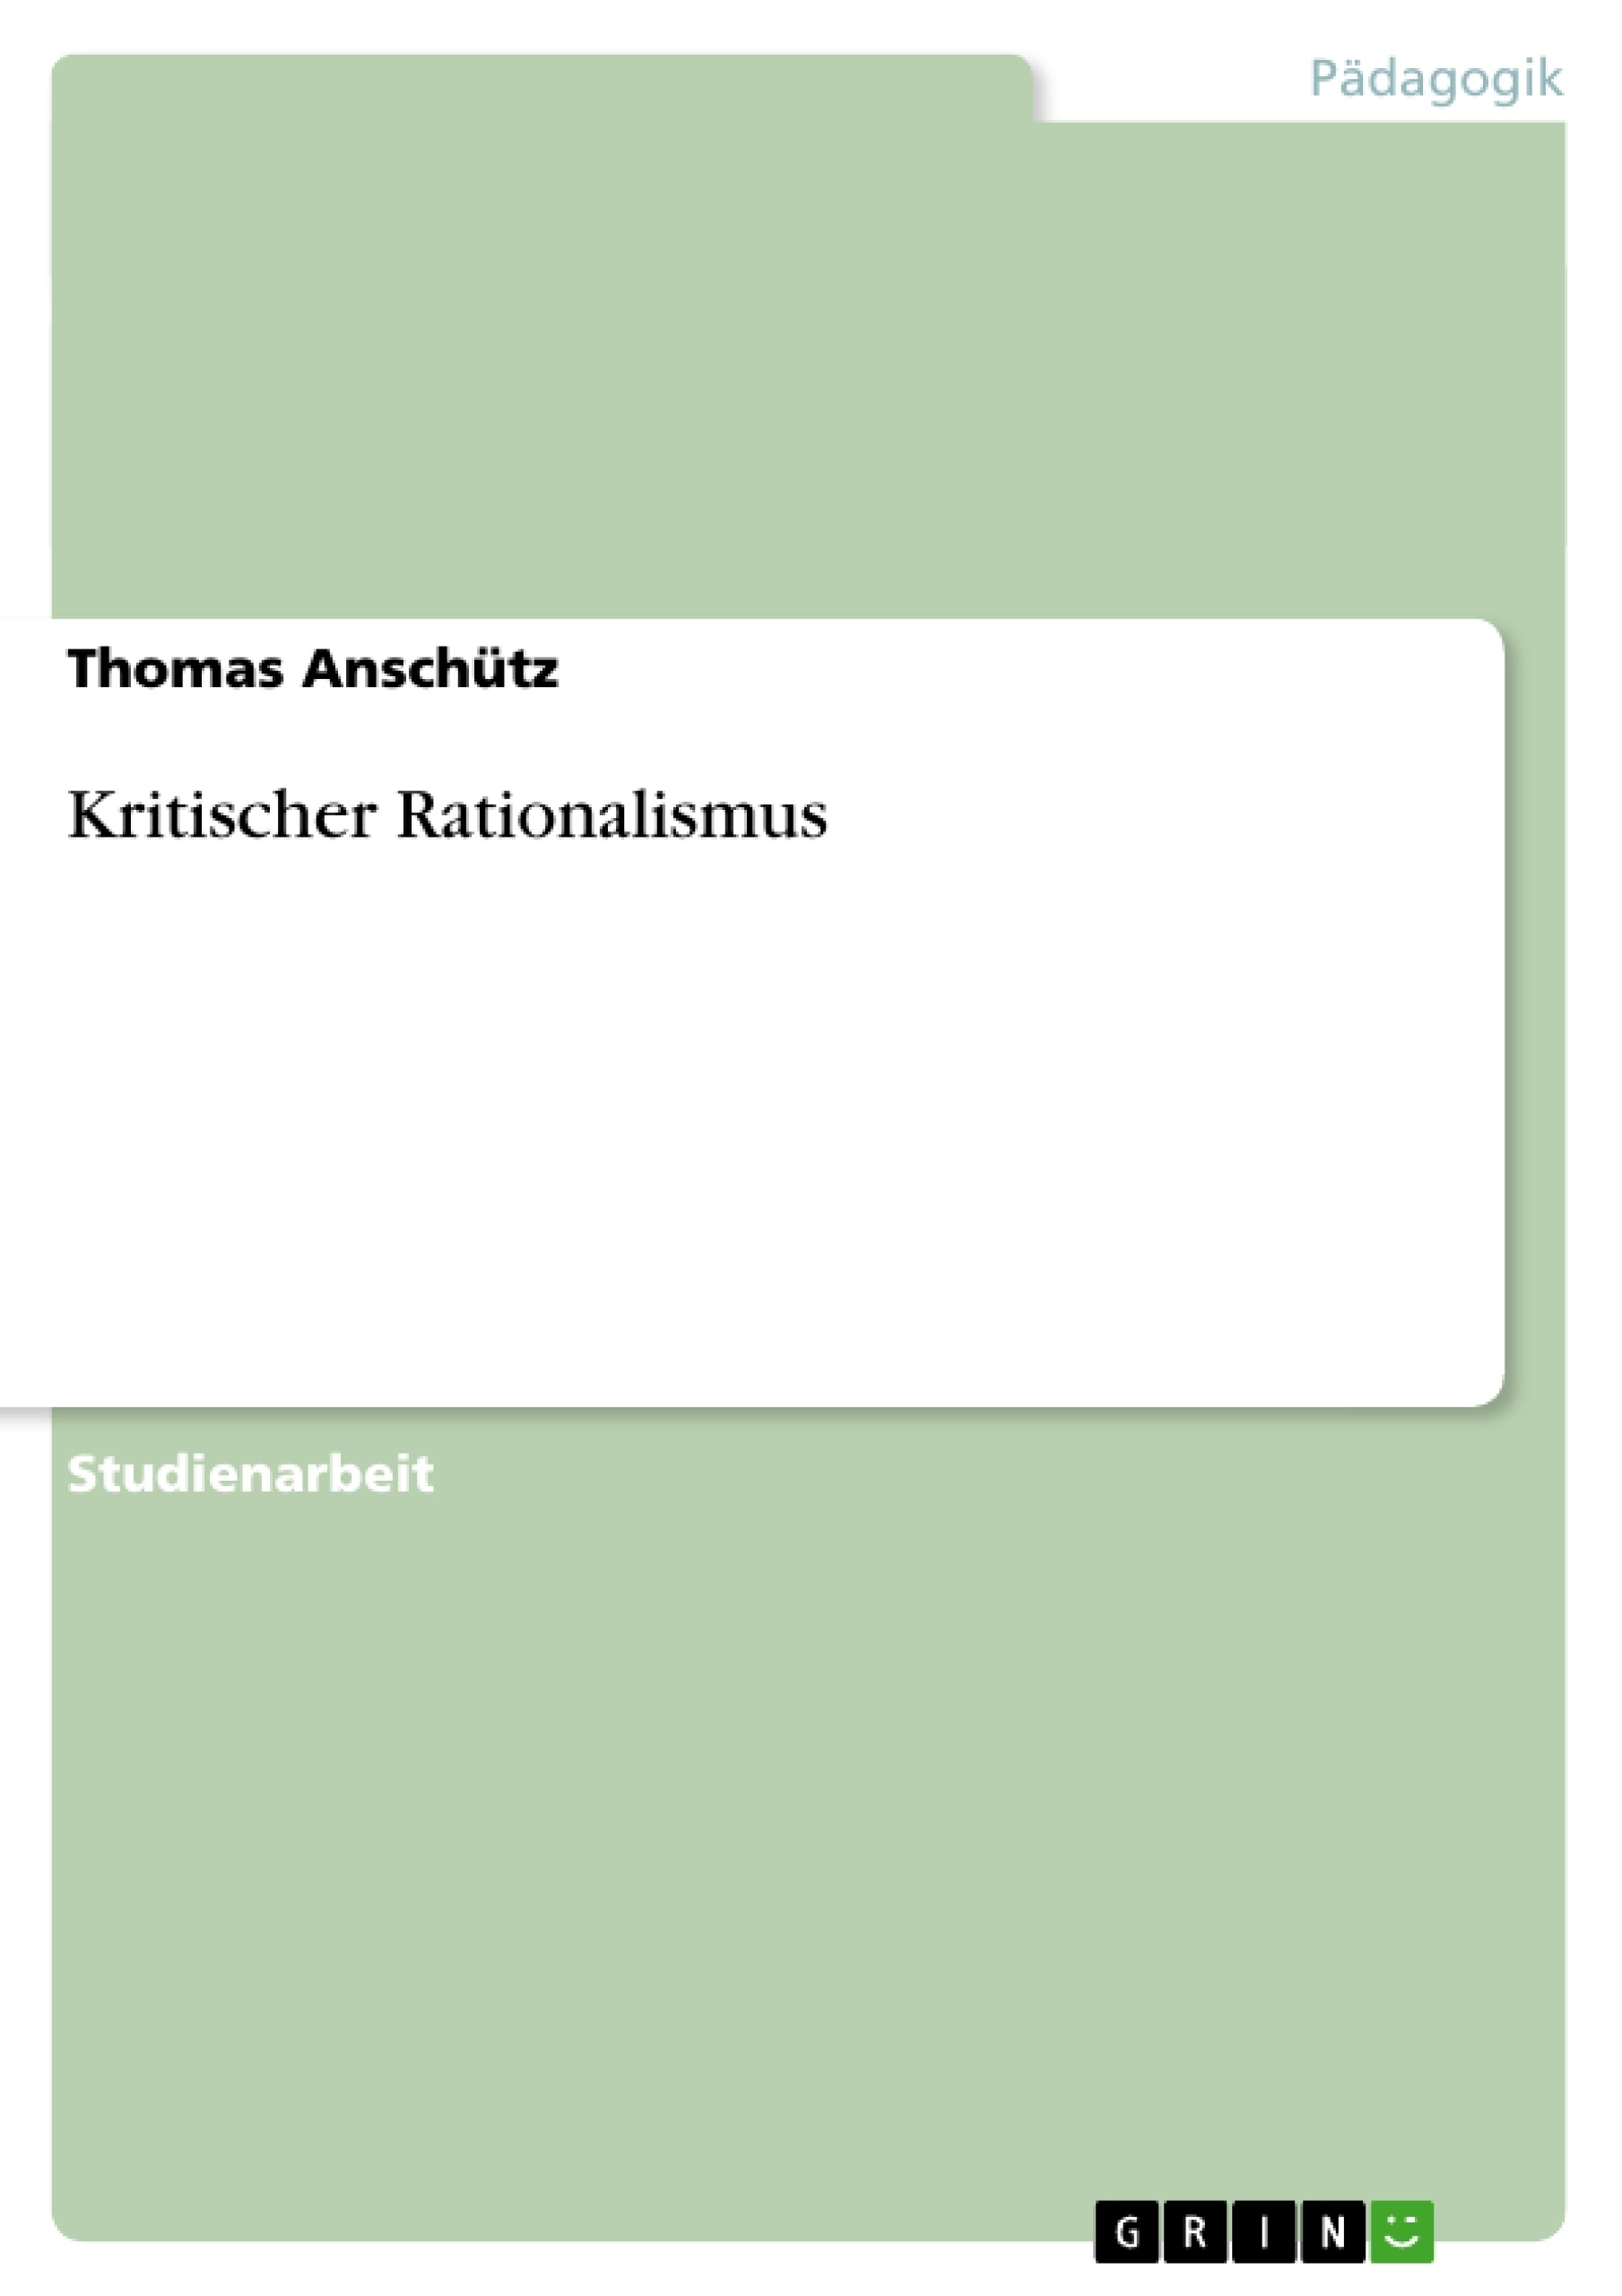 Titel: Kritischer Rationalismus